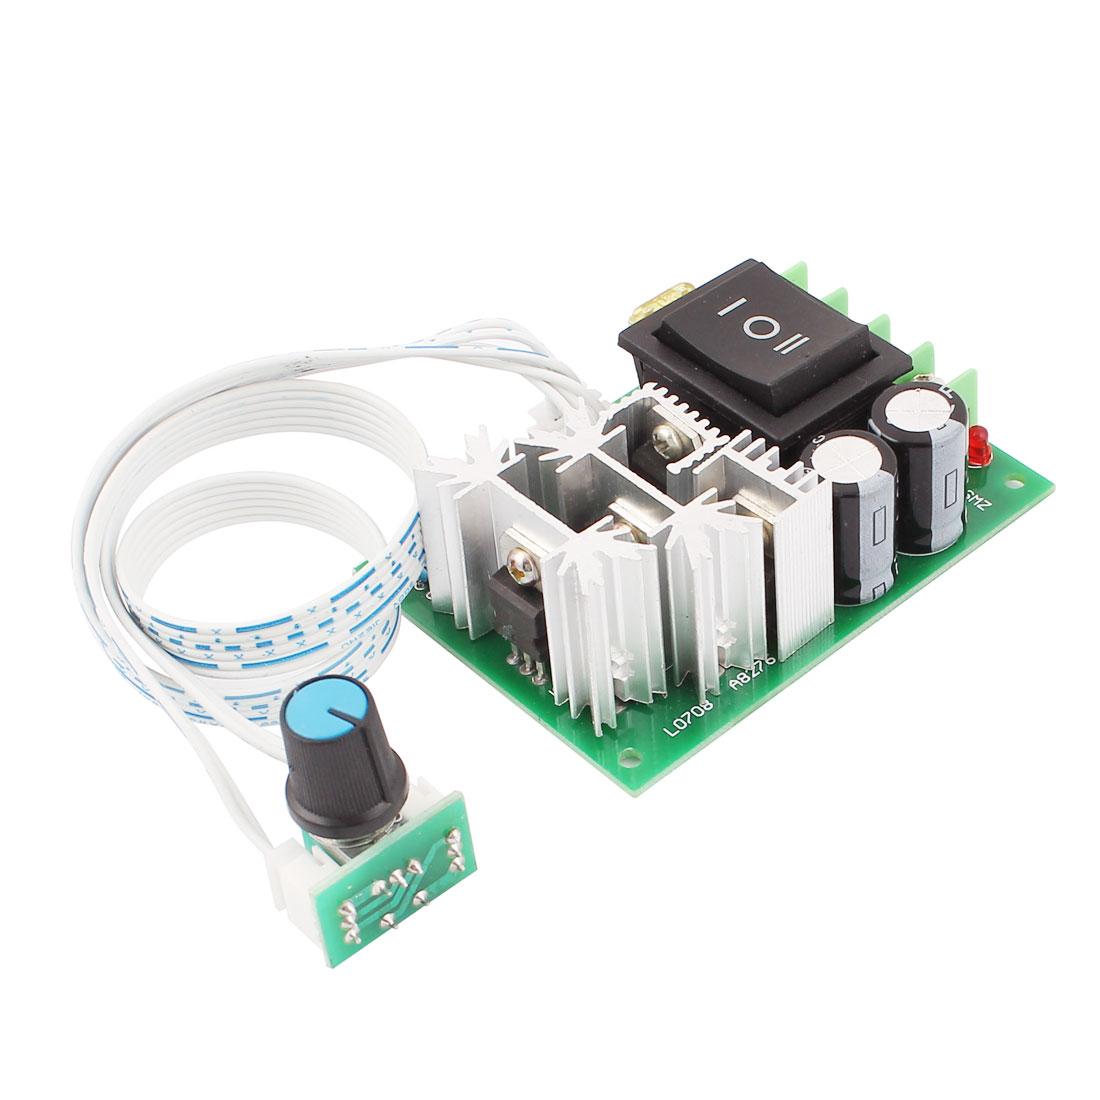 10V-60V 20A Pulse Width Modulator PWM DC Motor Speed Controller Control Switch